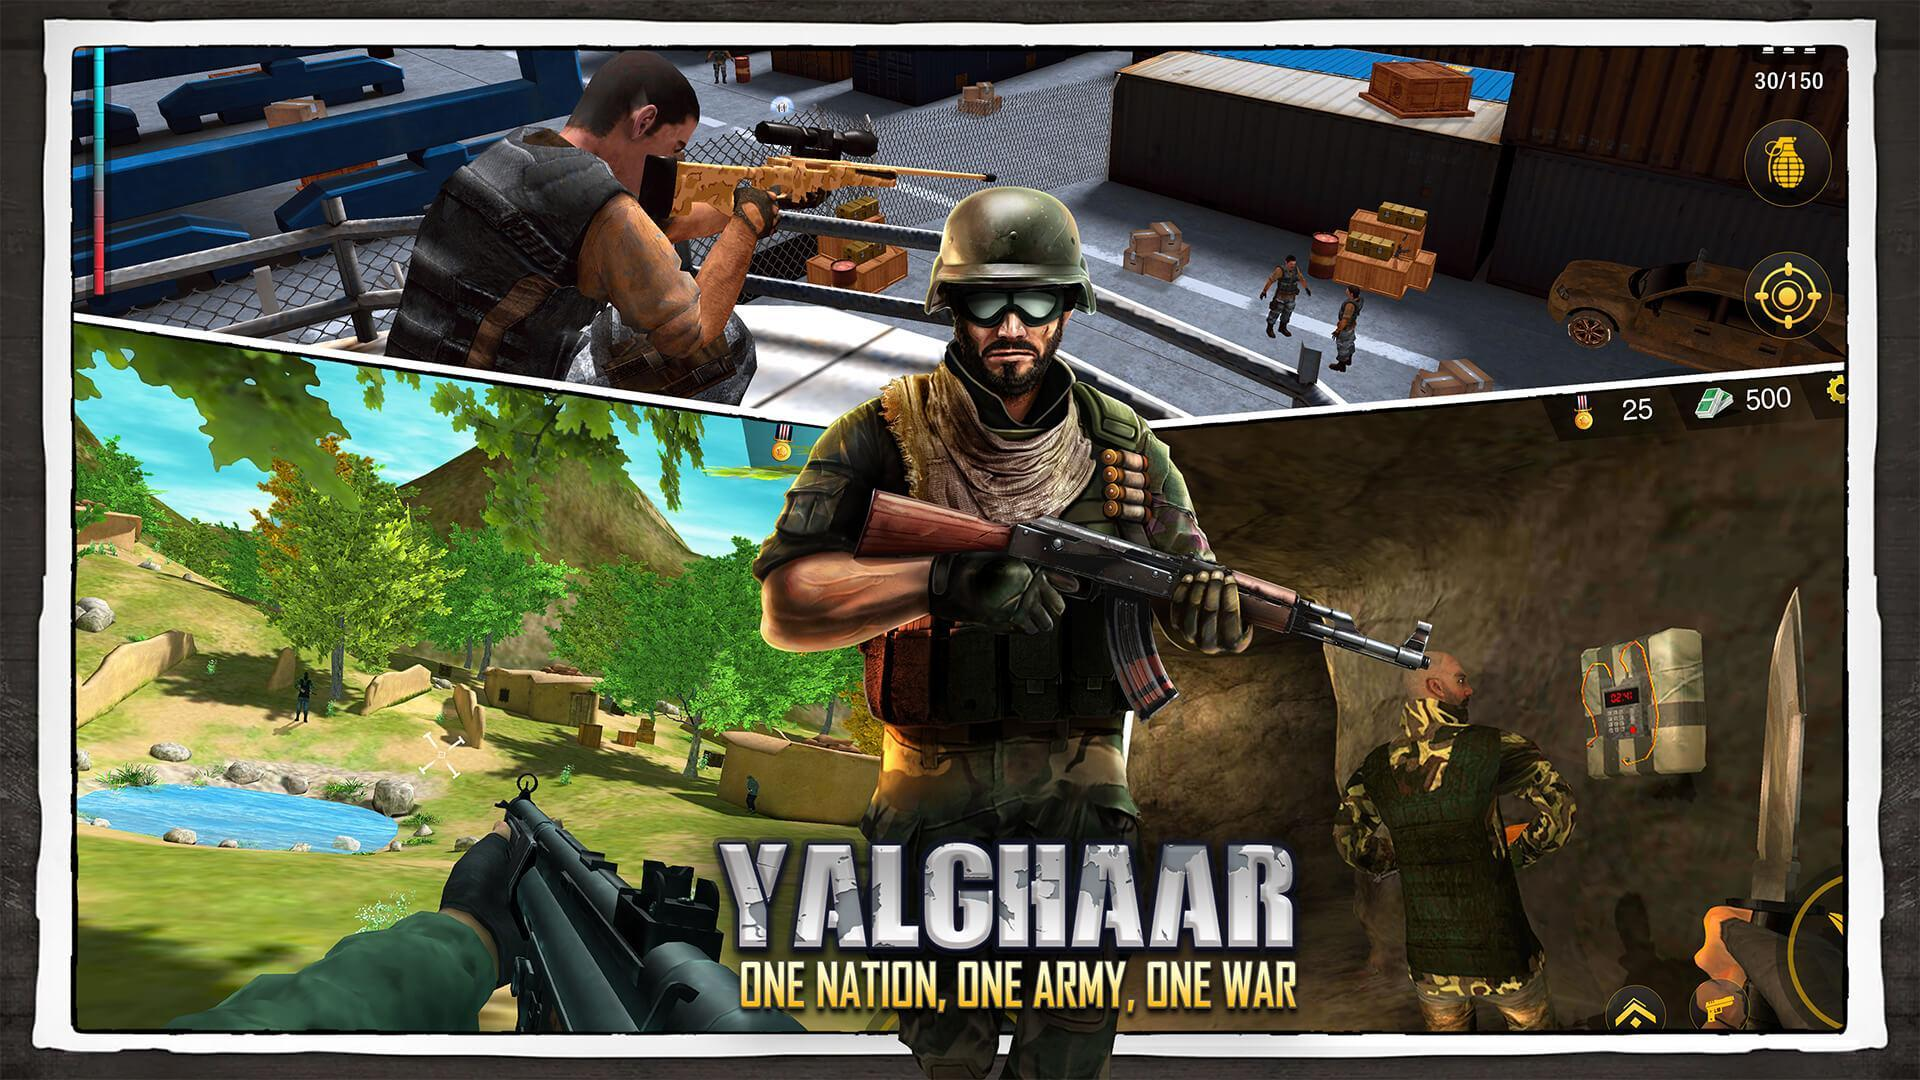 Yalghaar Delta IGI Commando Adventure Mobile Game 3.4 Screenshot 23